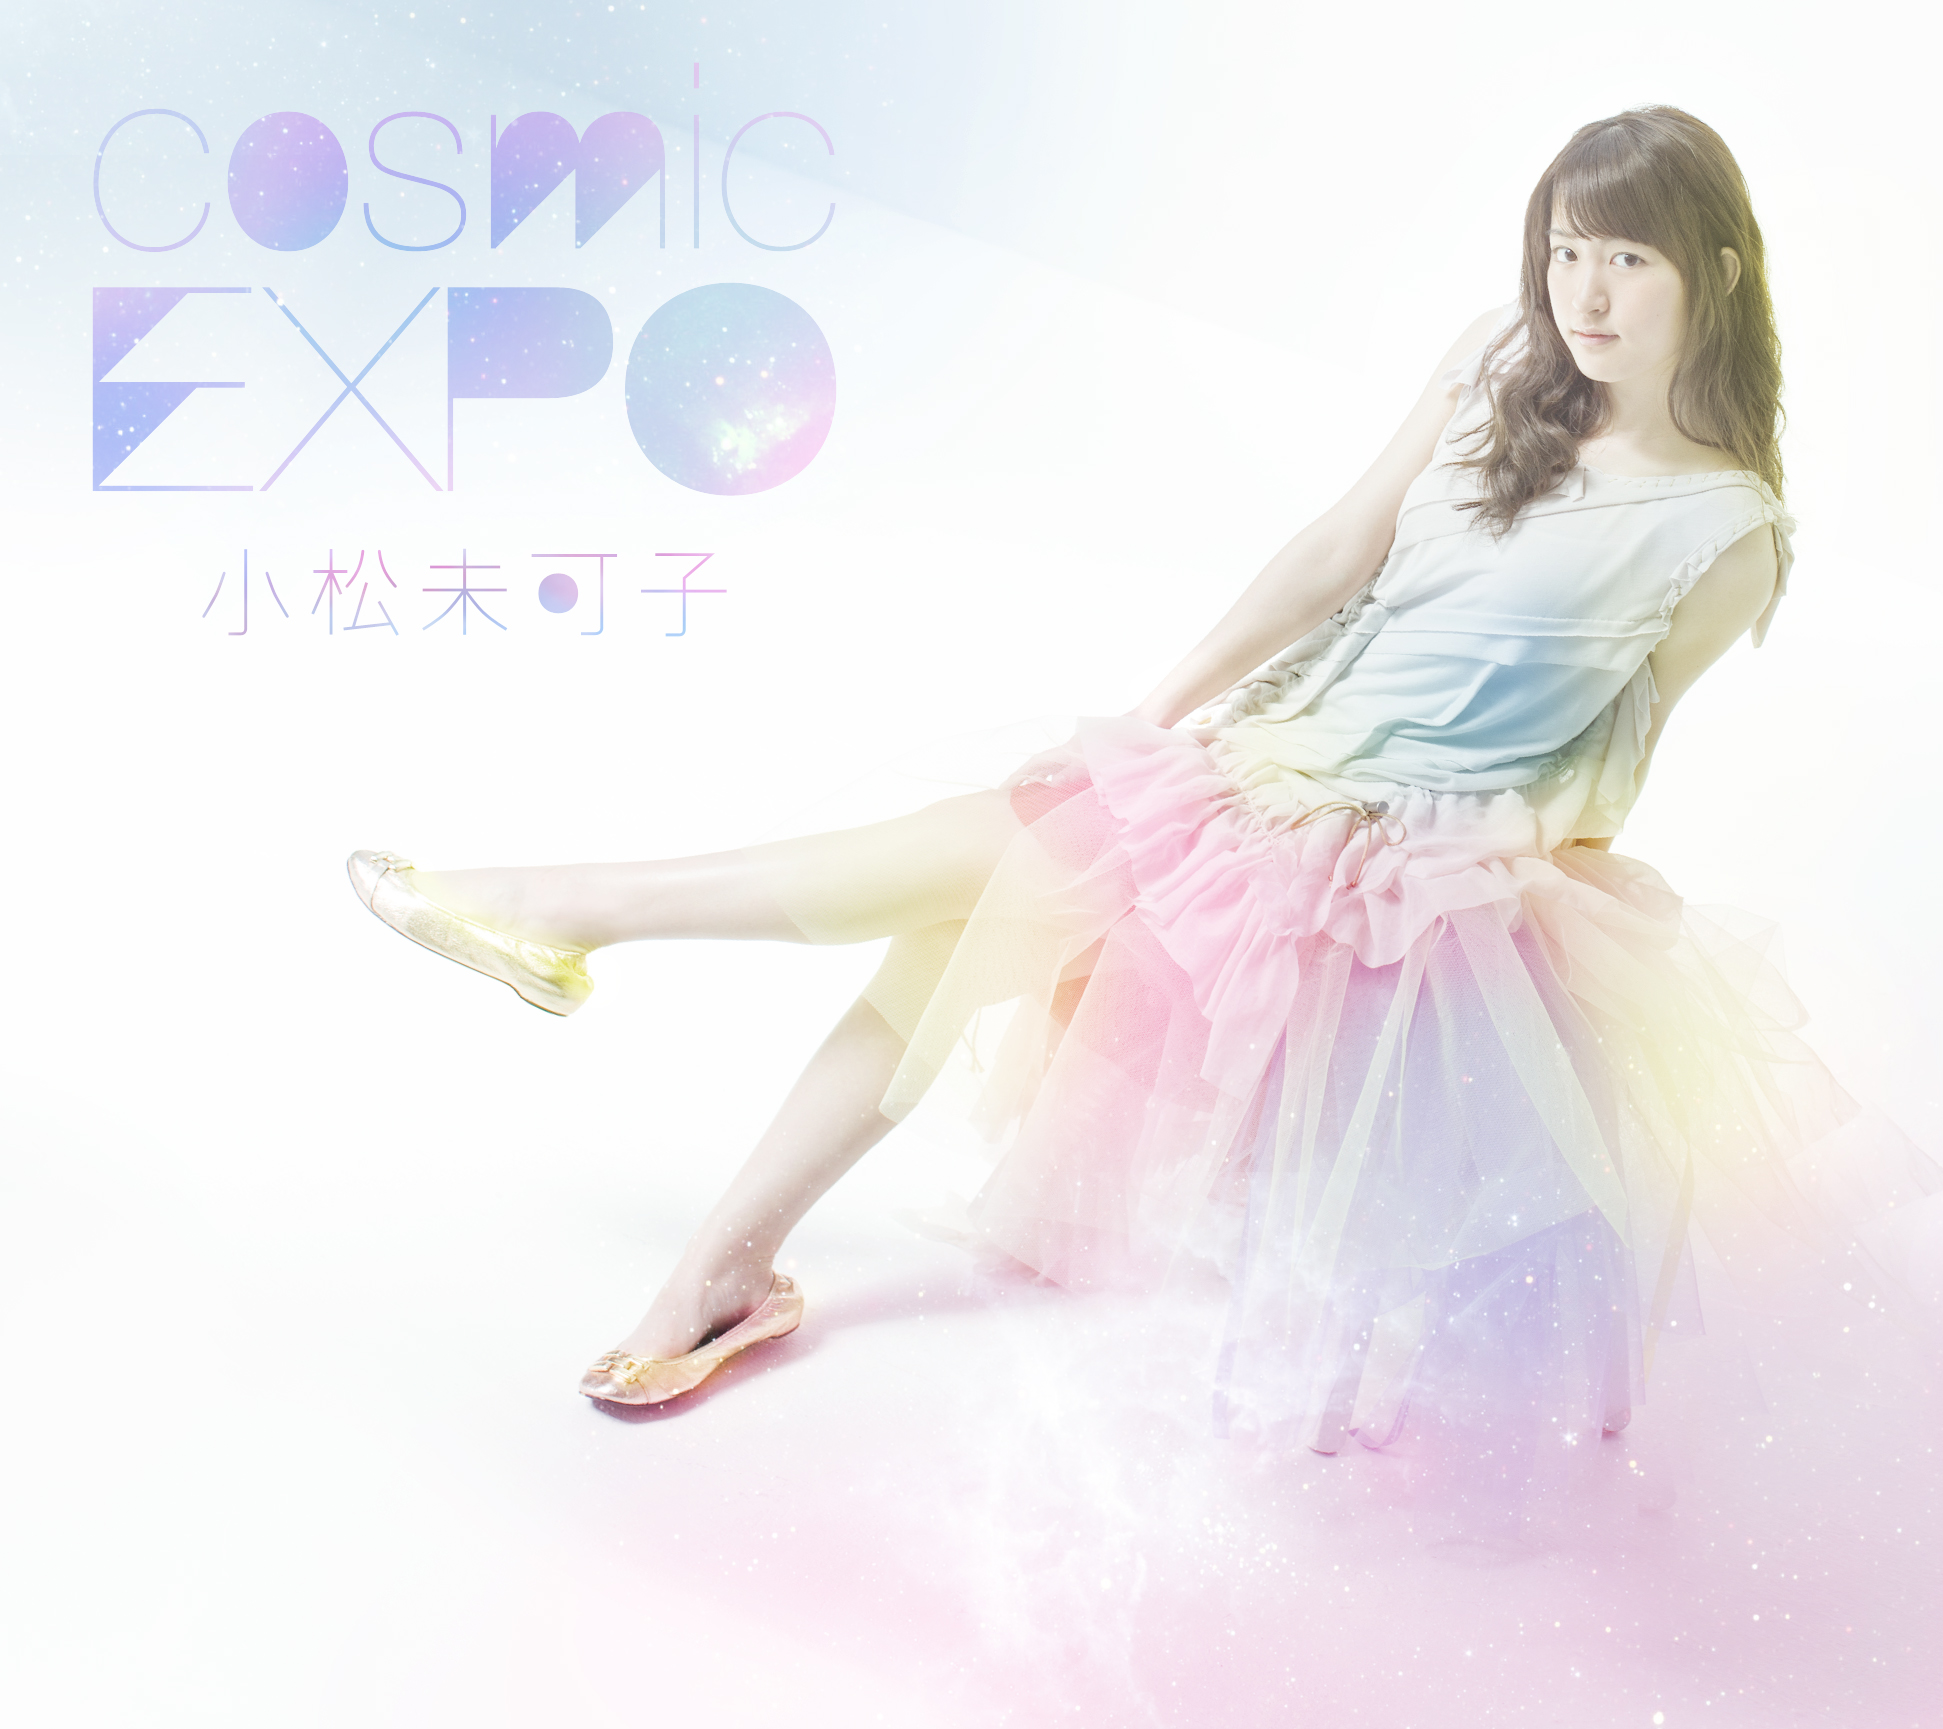 20180918.0254.7 Mikako Komatsu - Cosmic EXPO cover.jpg